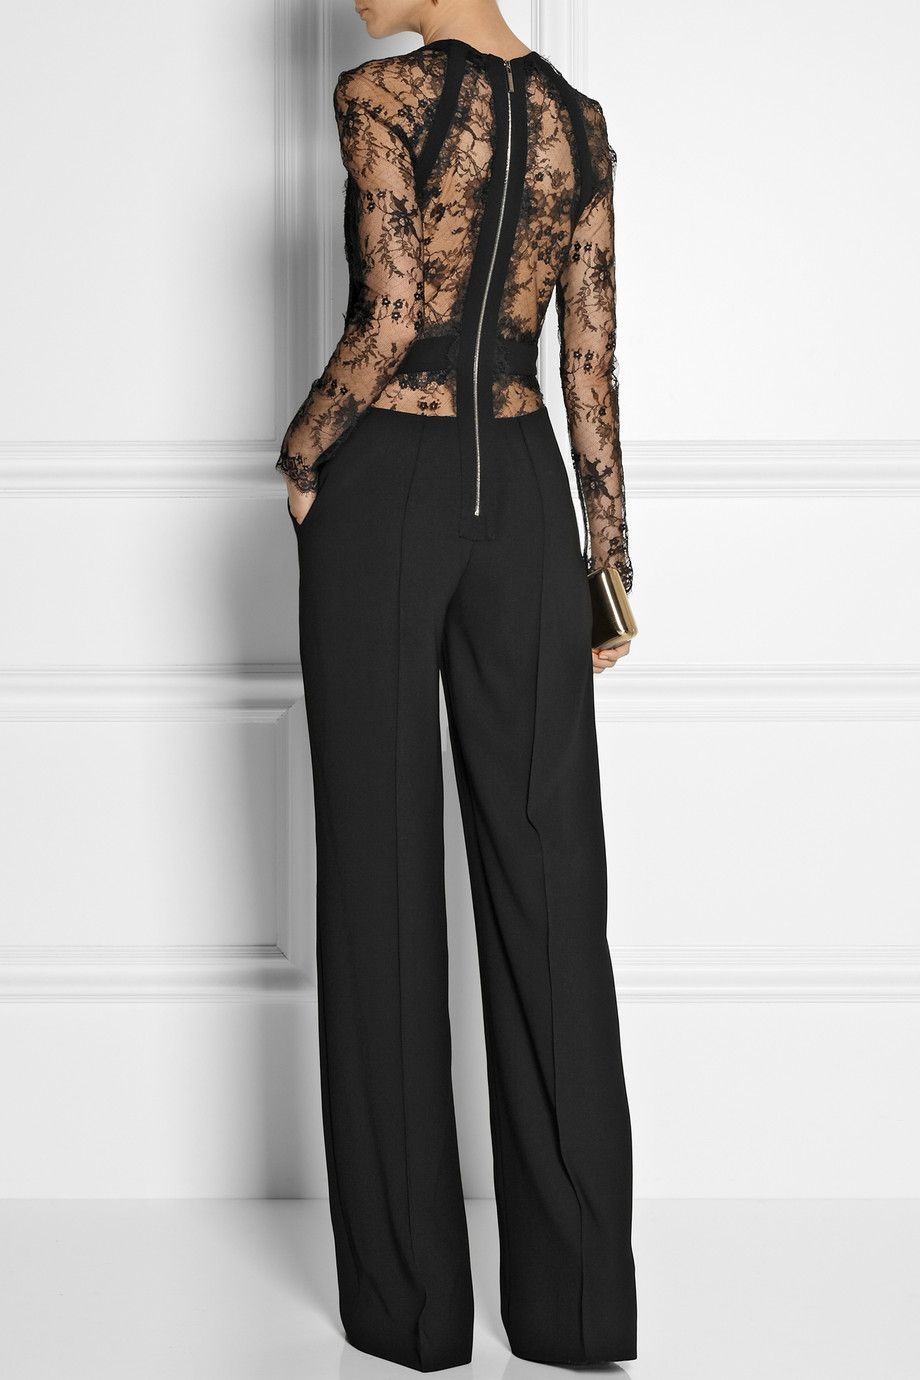 Elie Saab | Paneled lace and crepe jumpsuit | NET-A-PORTER.COM